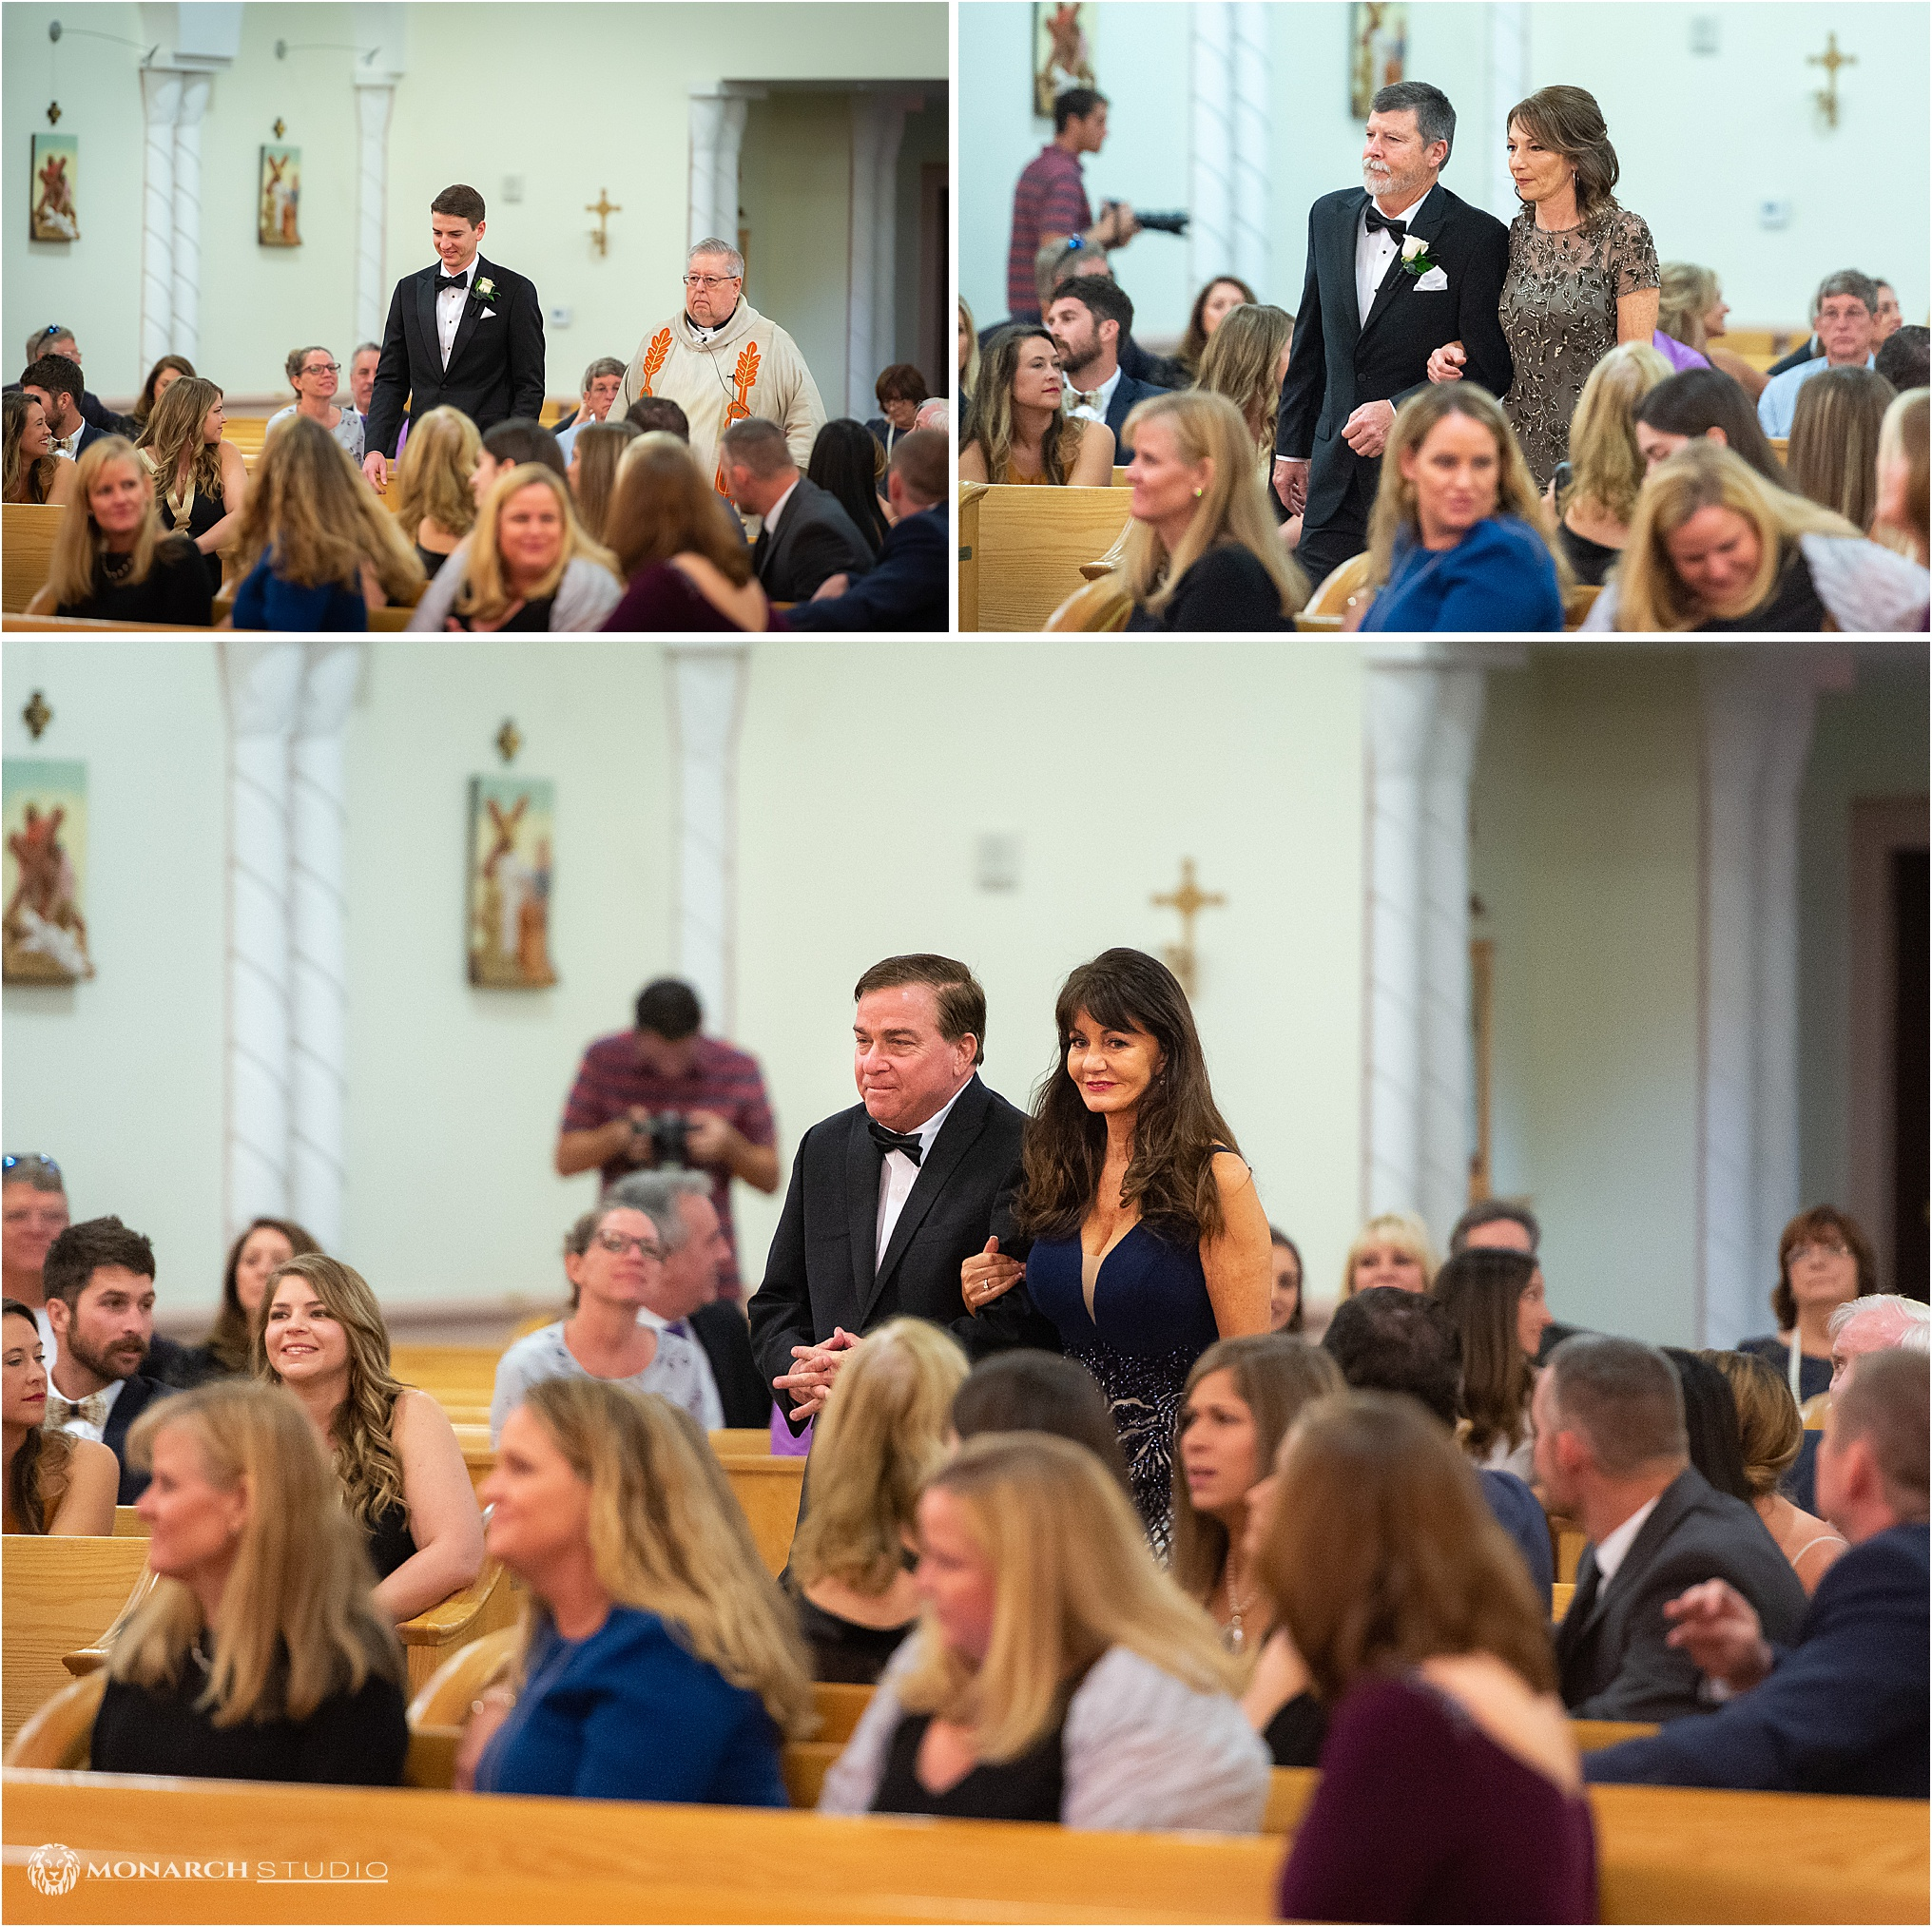 saint-augustine-wedding-photographer-treasury-015.jpg